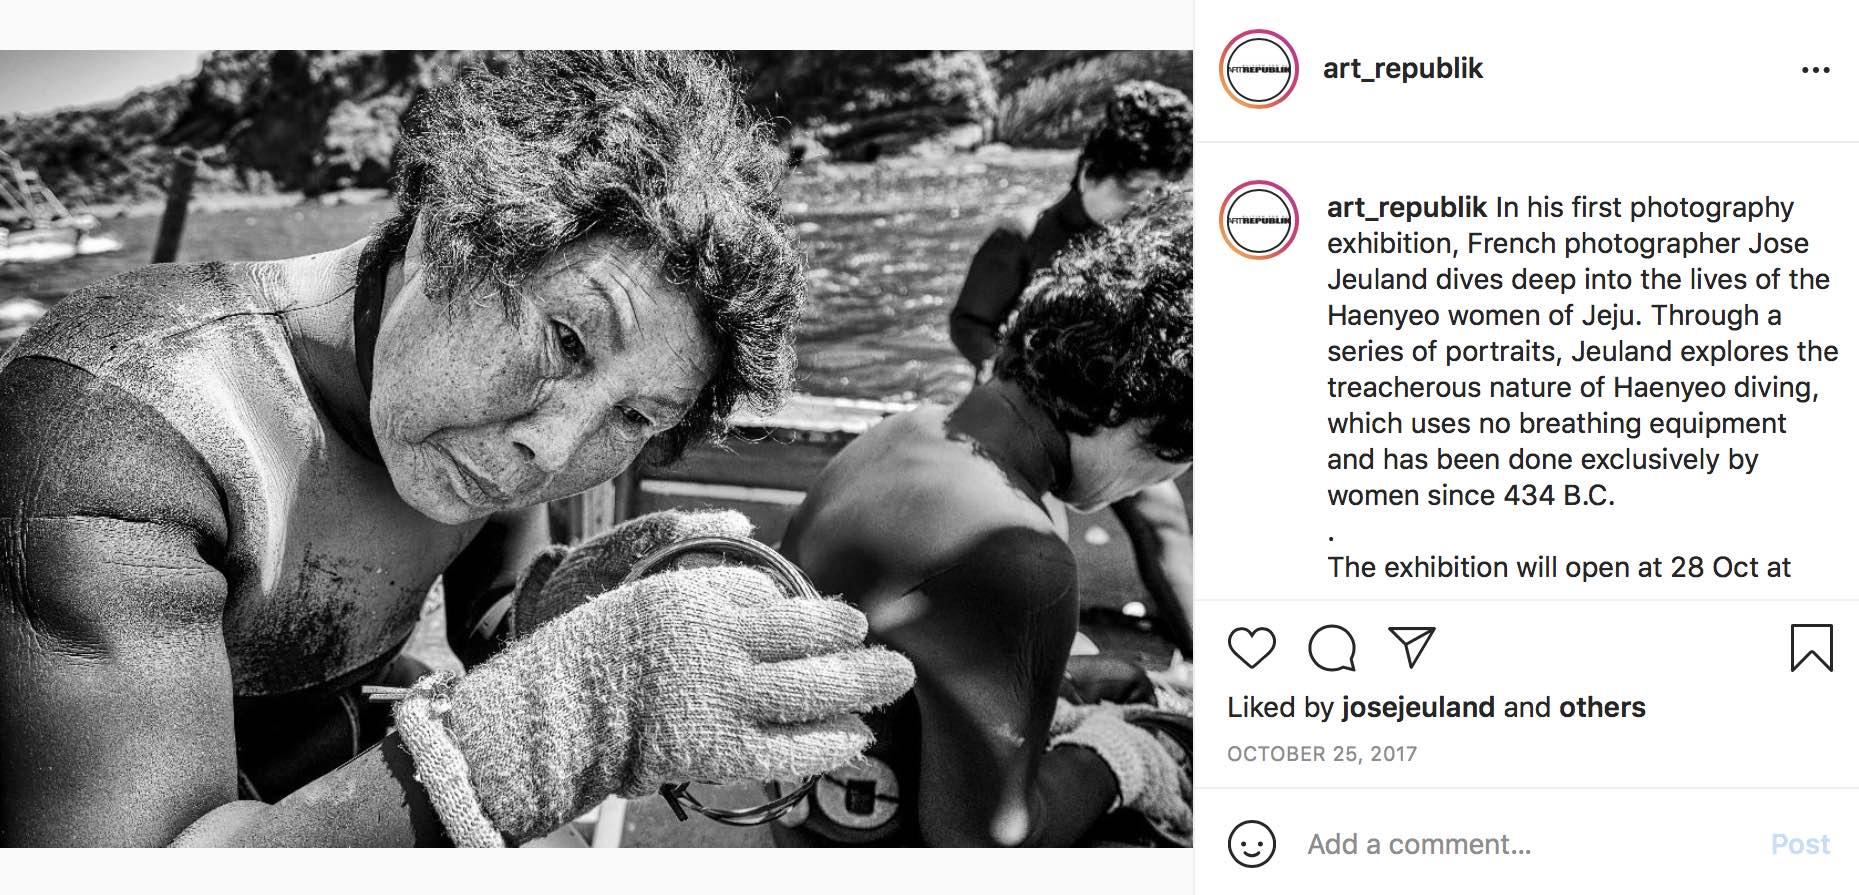 Art Republik Instagram Haenyeo Women Divers Jose Jeuland 3